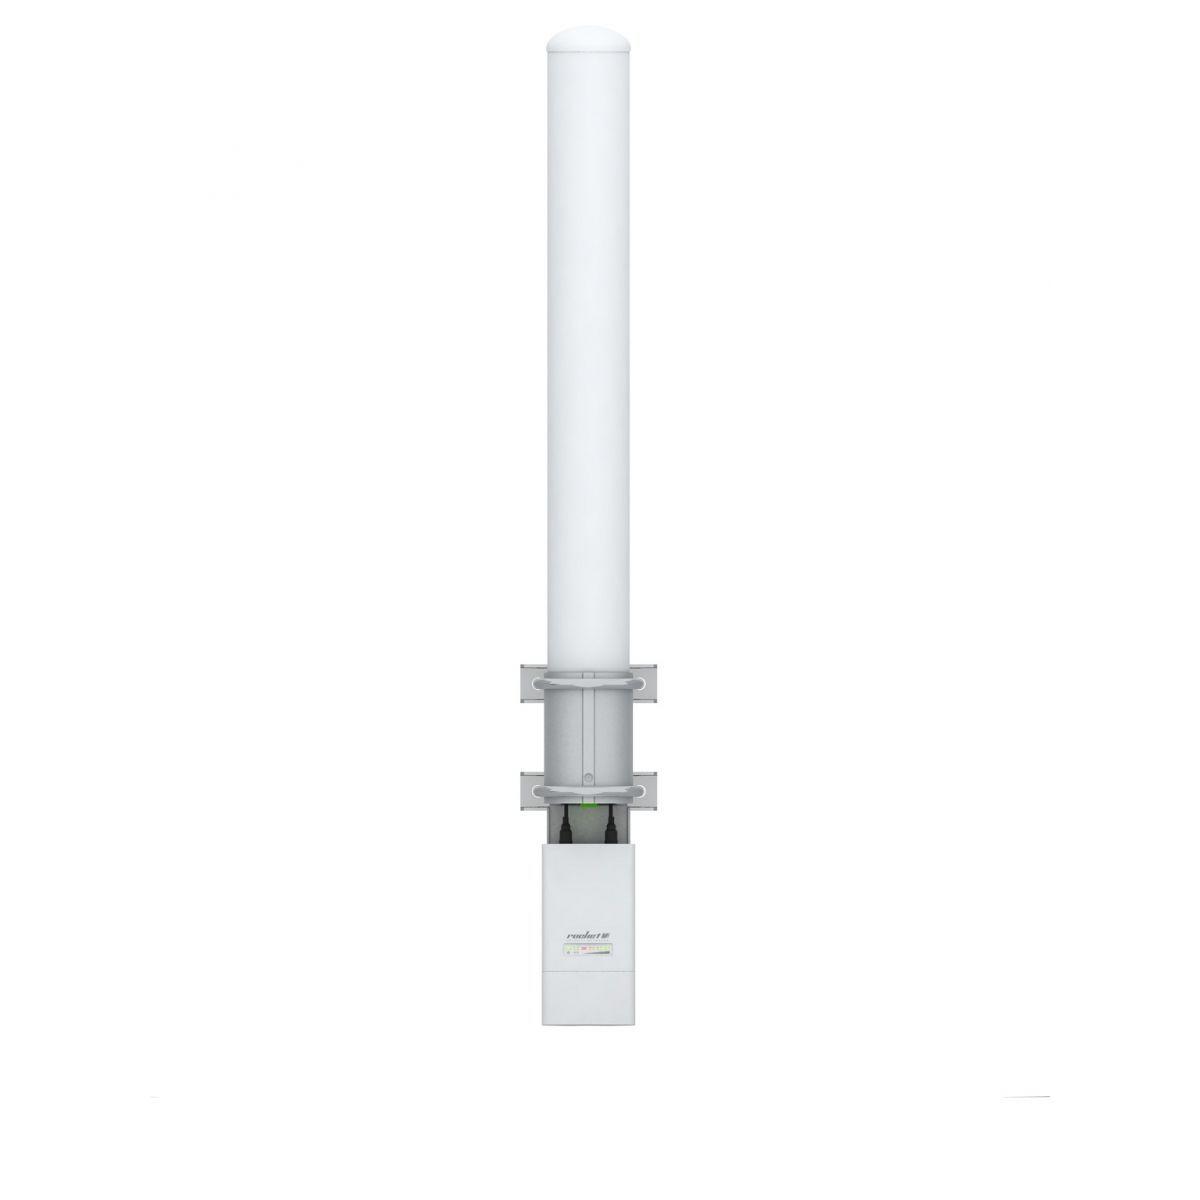 Ubiquiti Airmax Antena Amo-2g13 Omni 13dbi 2.4G